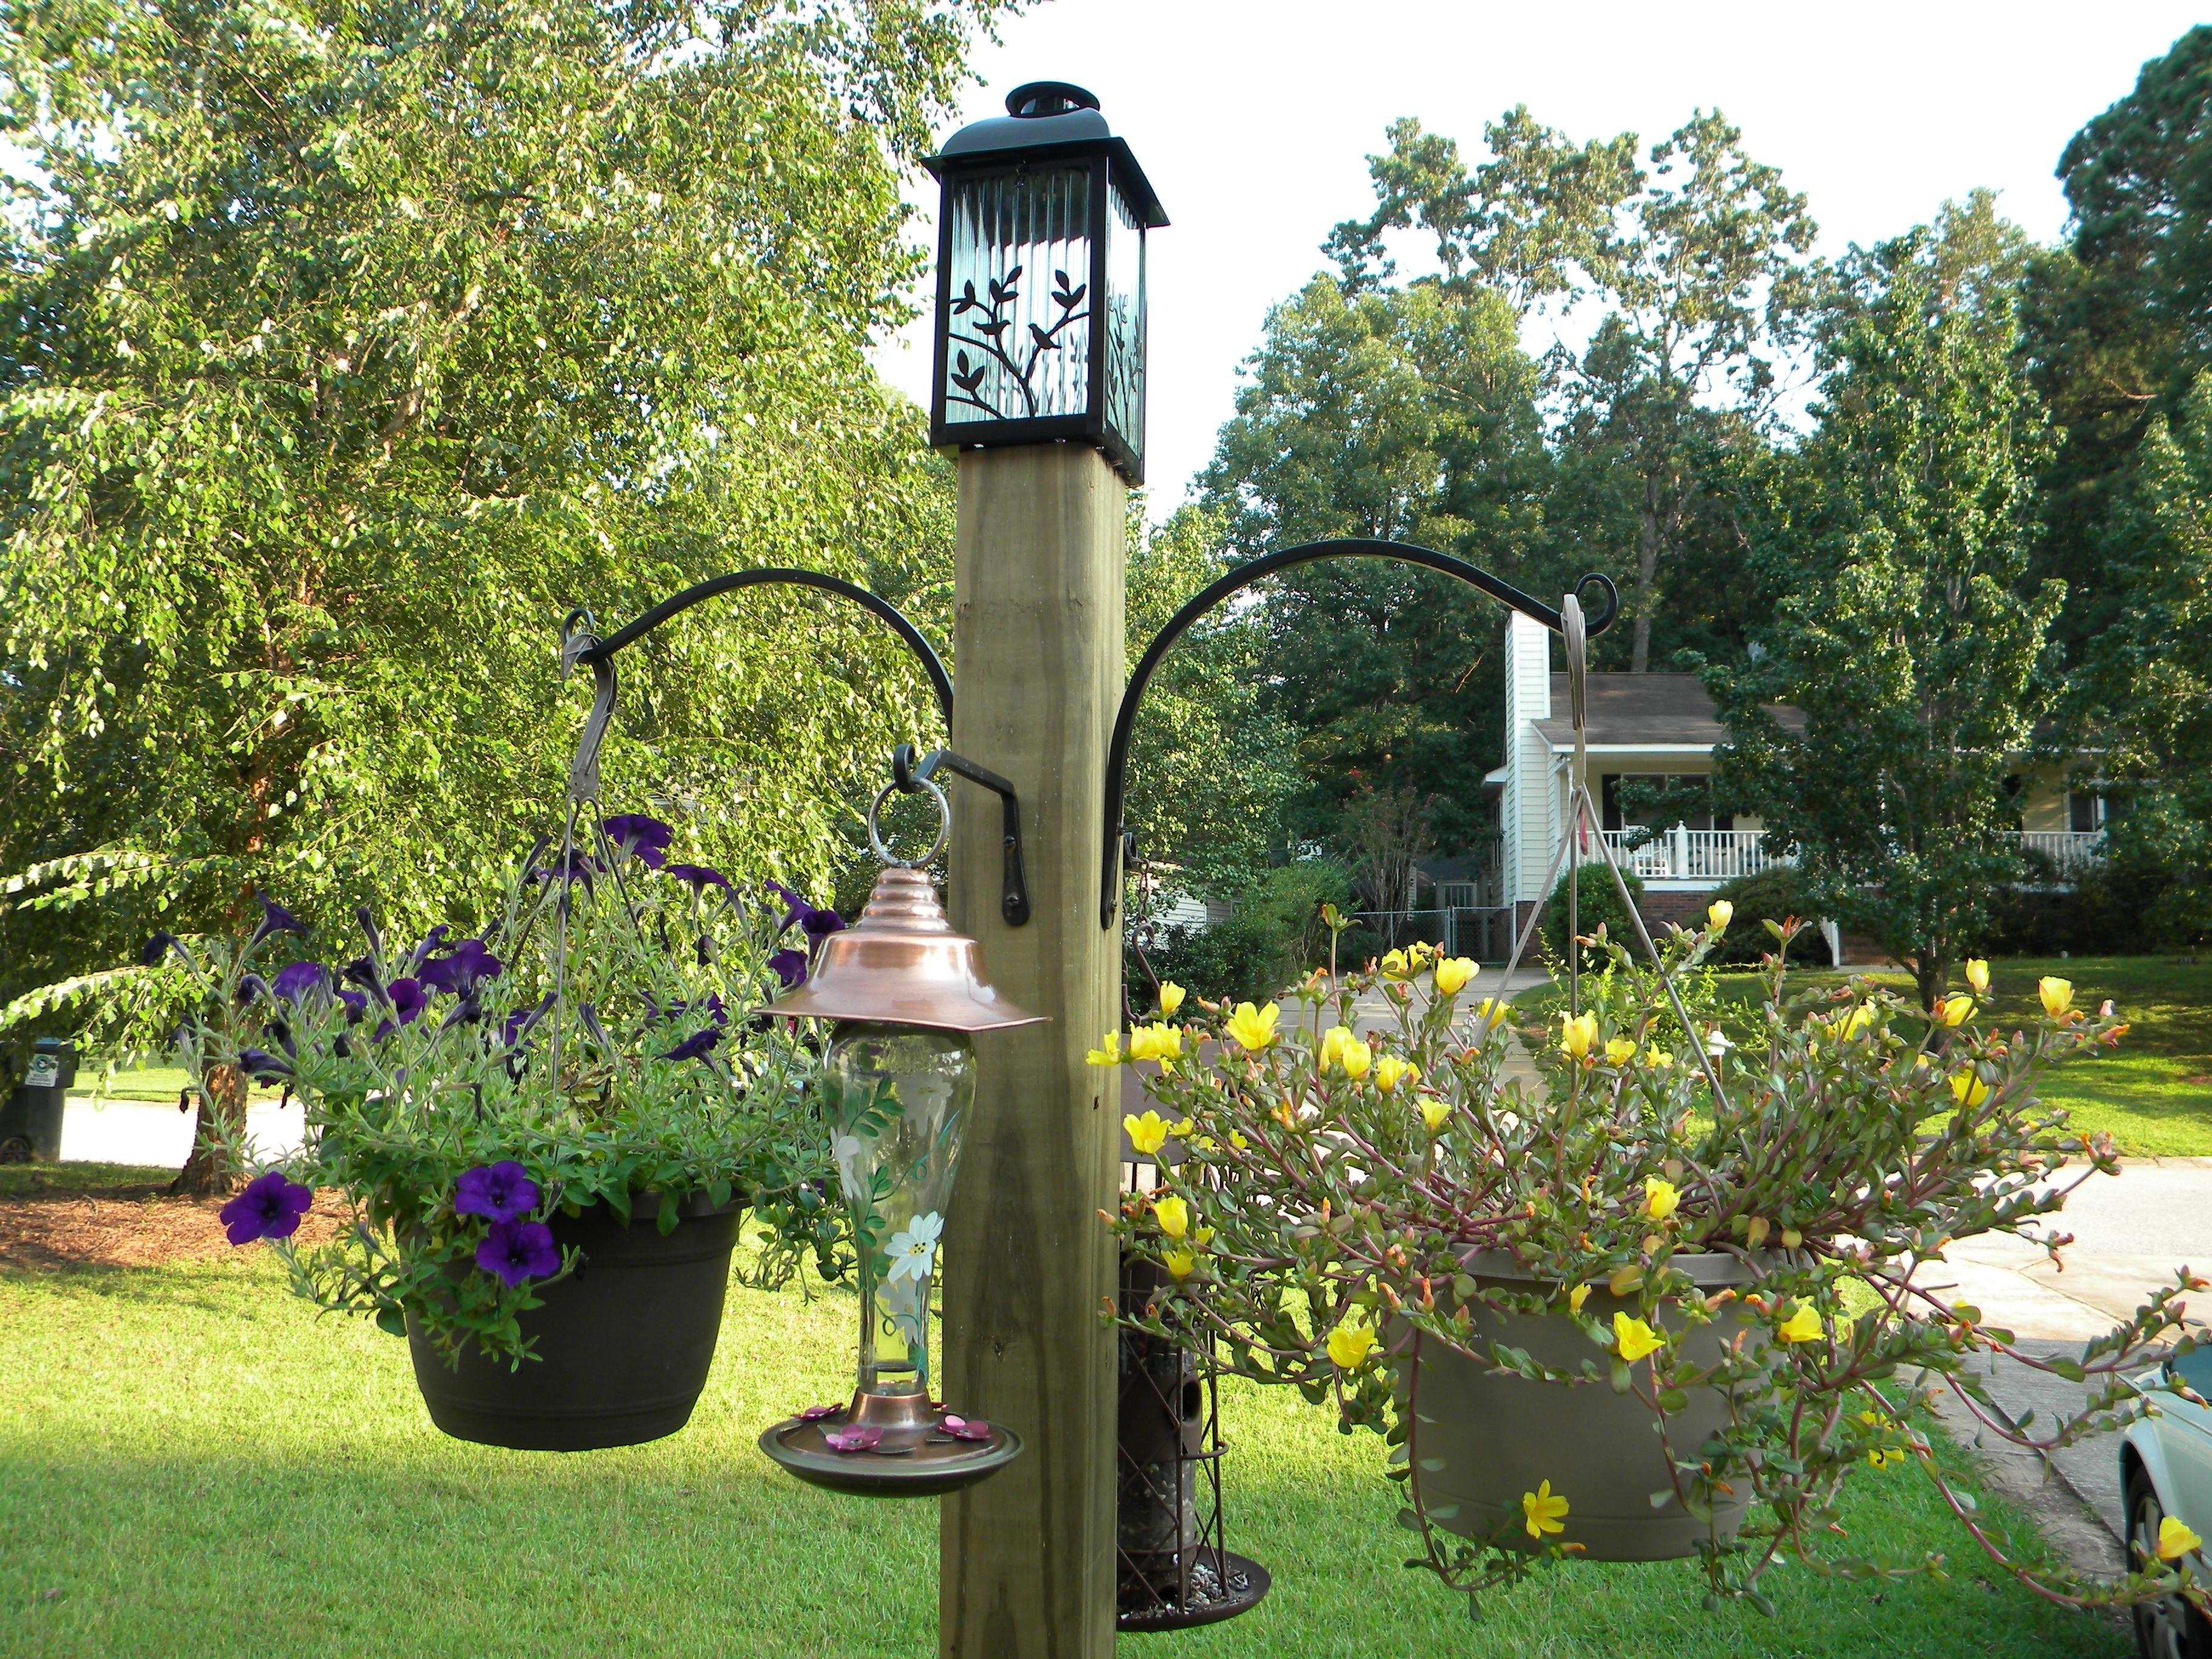 plant pole bird freestanding feeder light basket hooks and hanging pin diy flower post solar garden